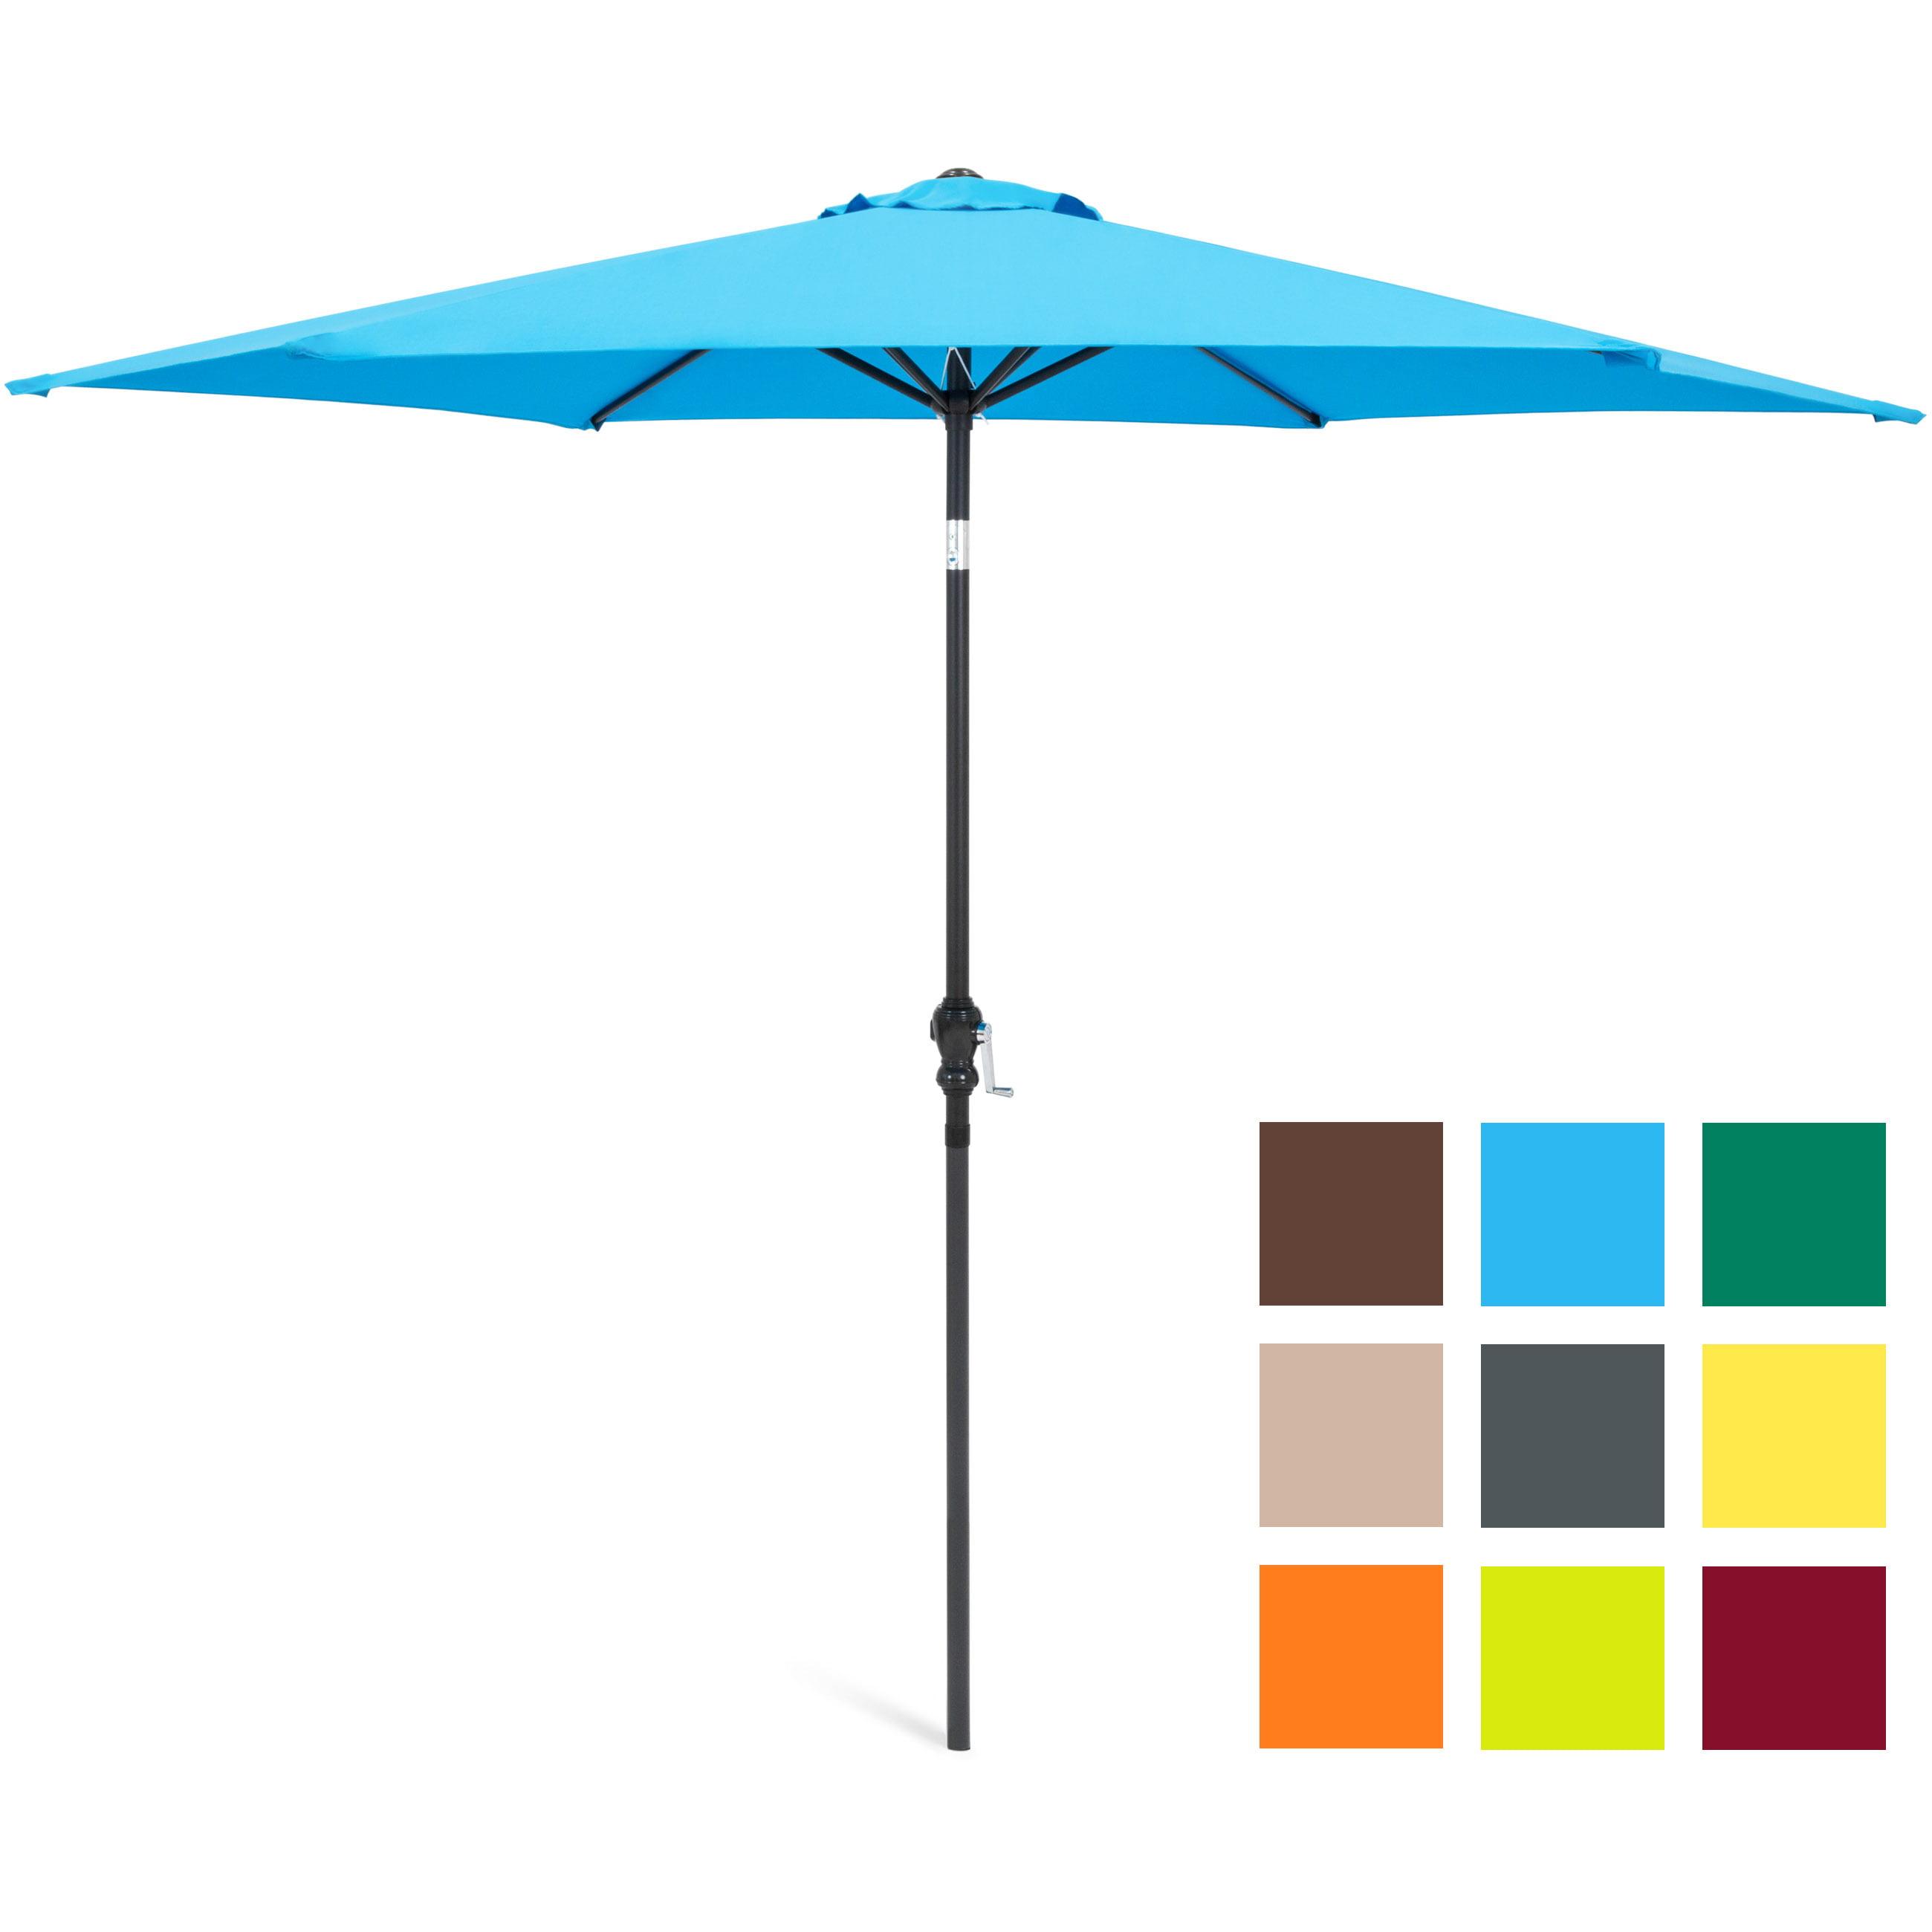 10FT Steel Market Outdoor Patio Umbrella Crank, Tilt Push Button Multiple Colors